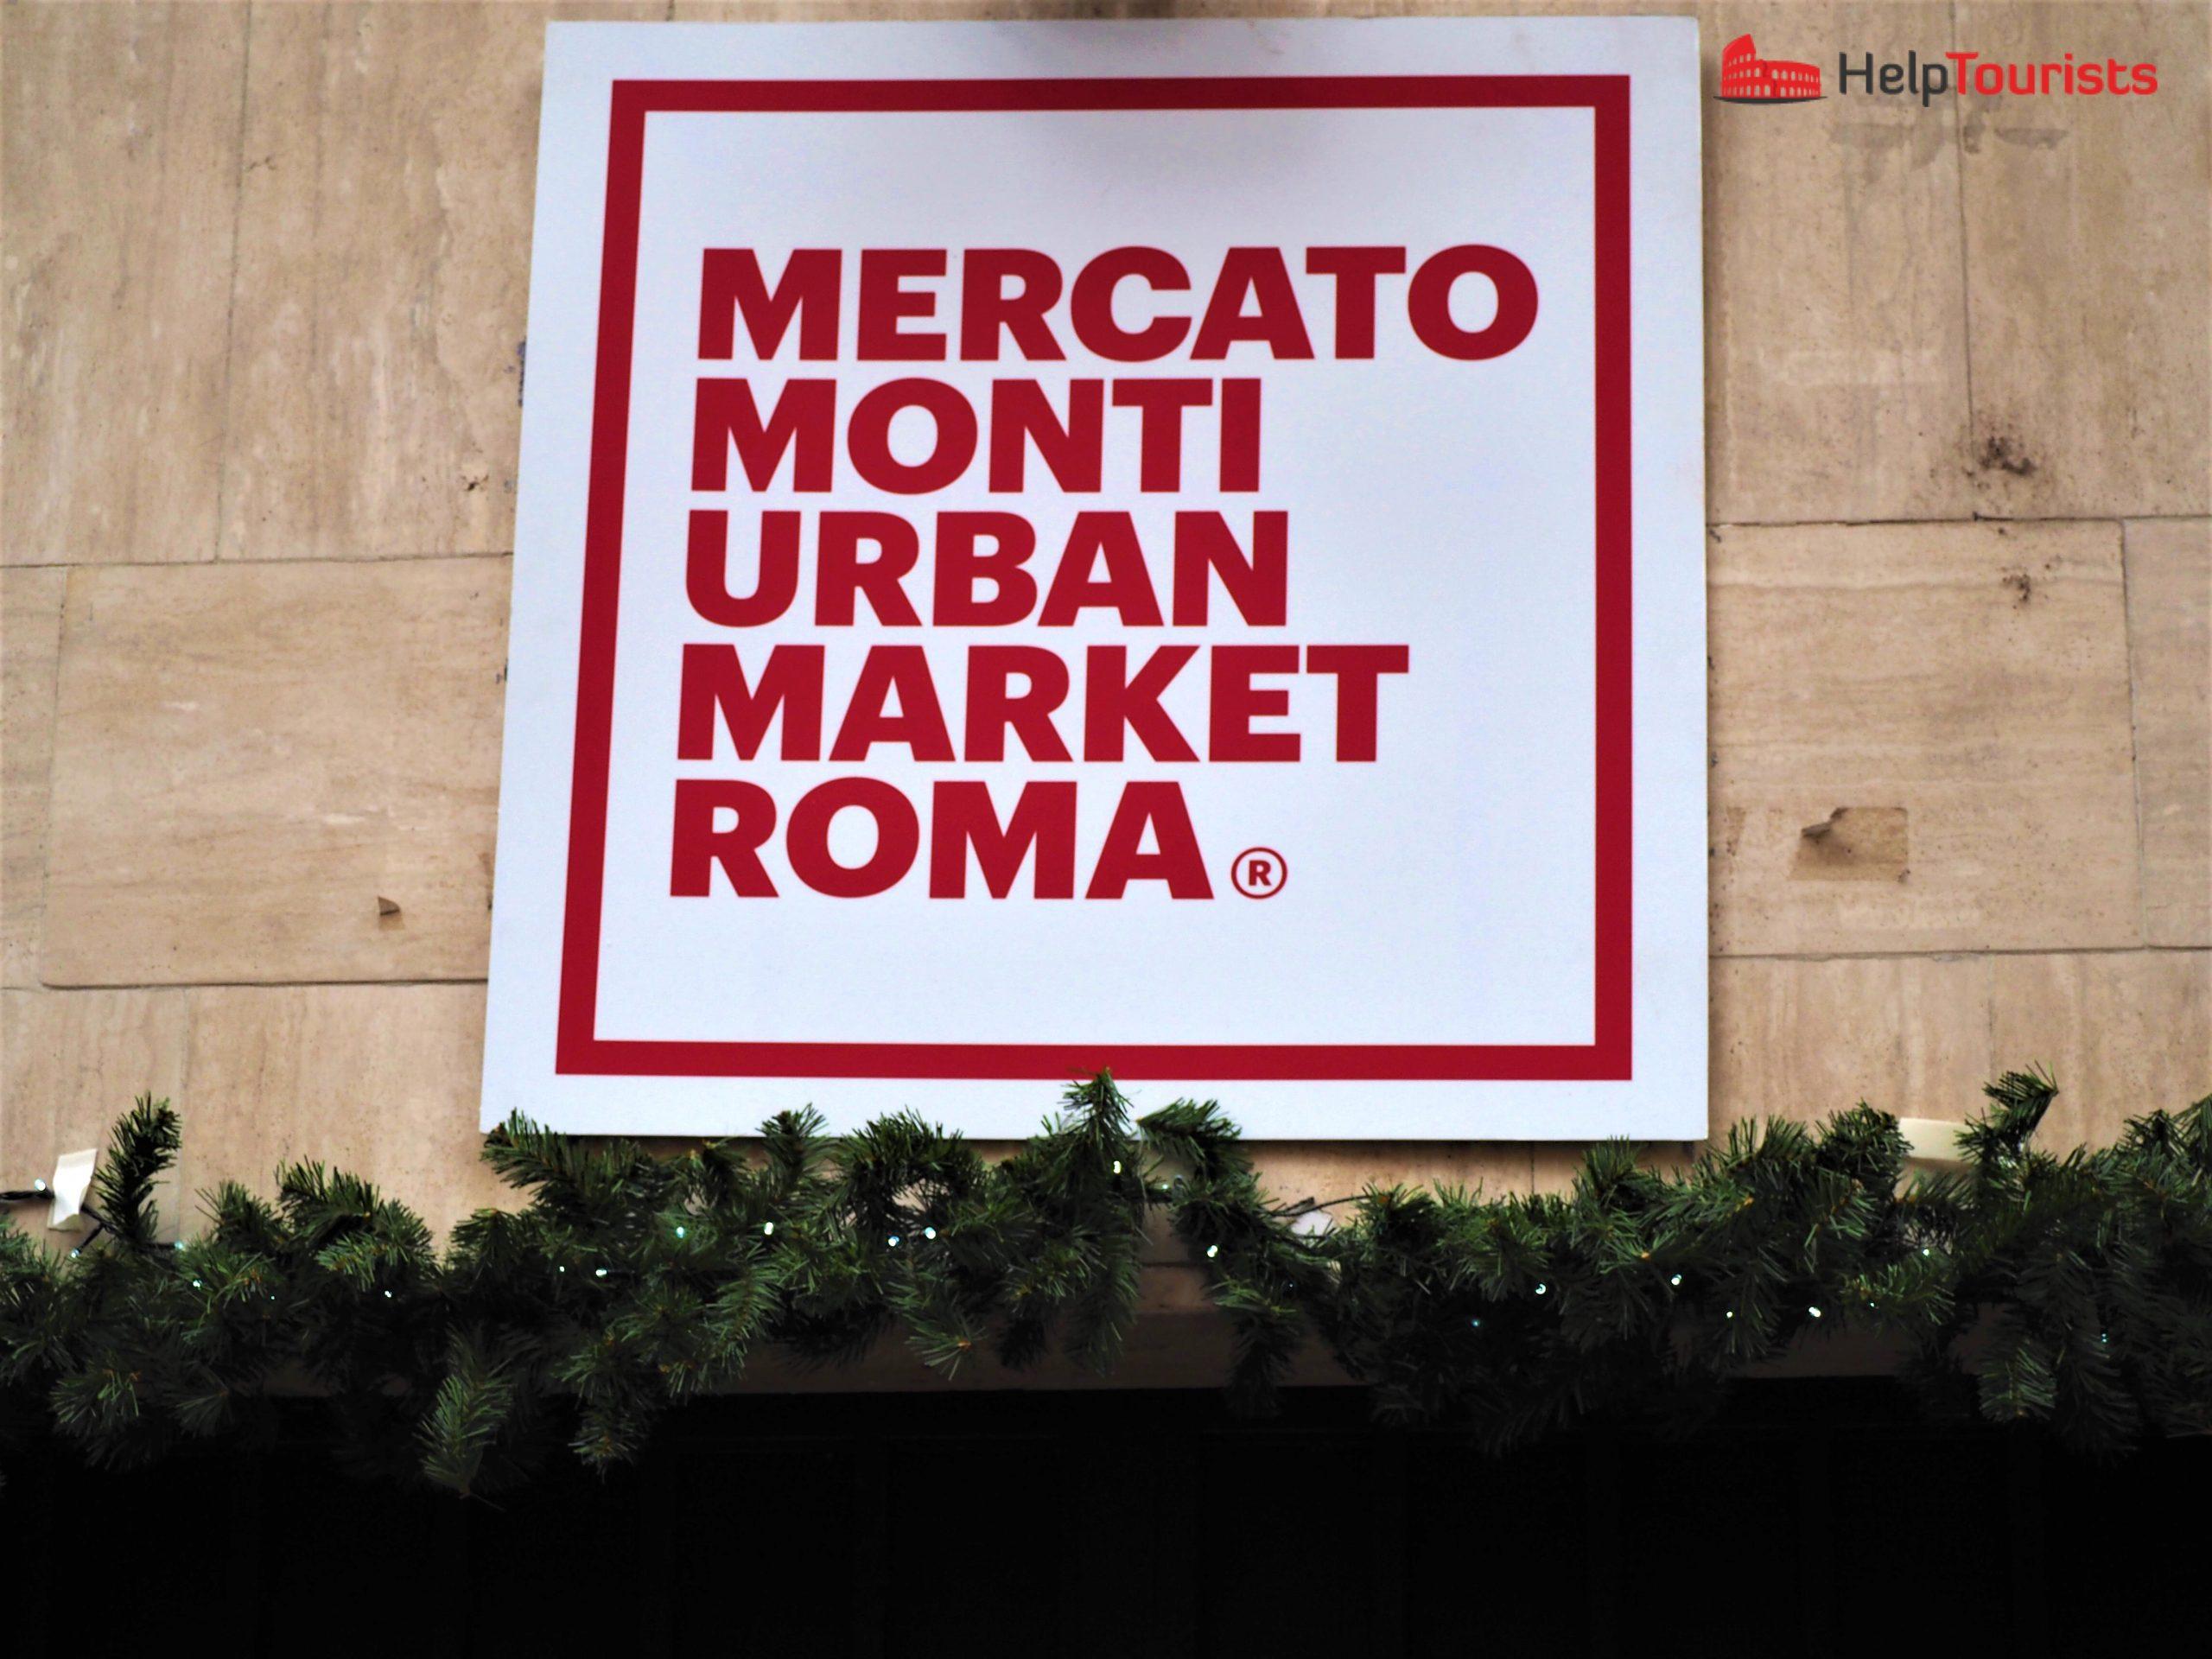 Rom Weihnachtsmarkt Mercato Monti